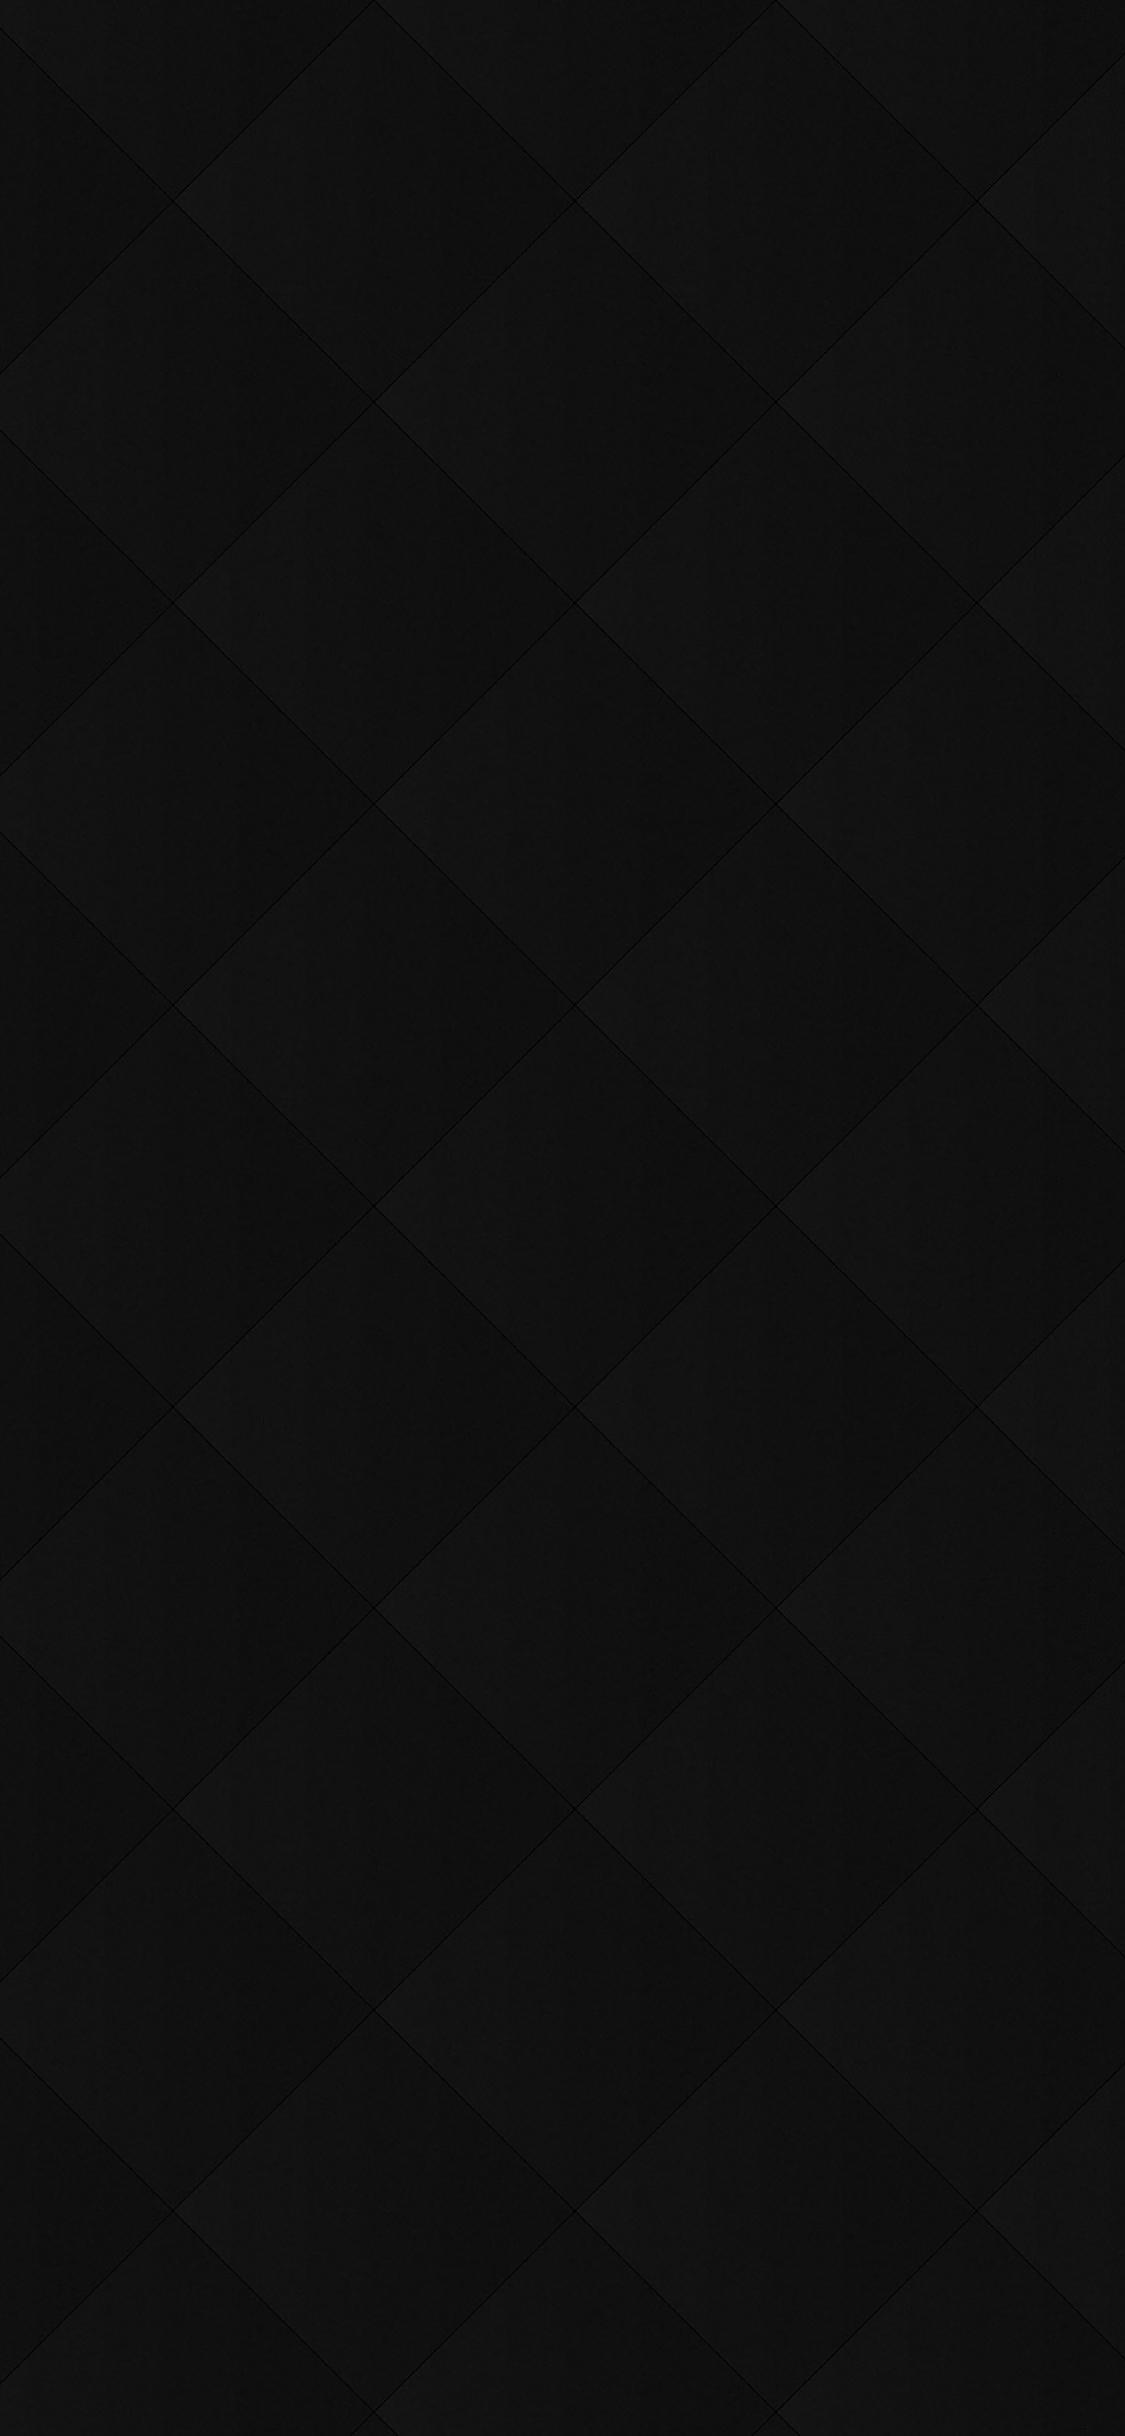 iPhoneXpapers.com-Apple-iPhone-wallpaper-vb09-wallpaper-gradient-squares-dark-pattern